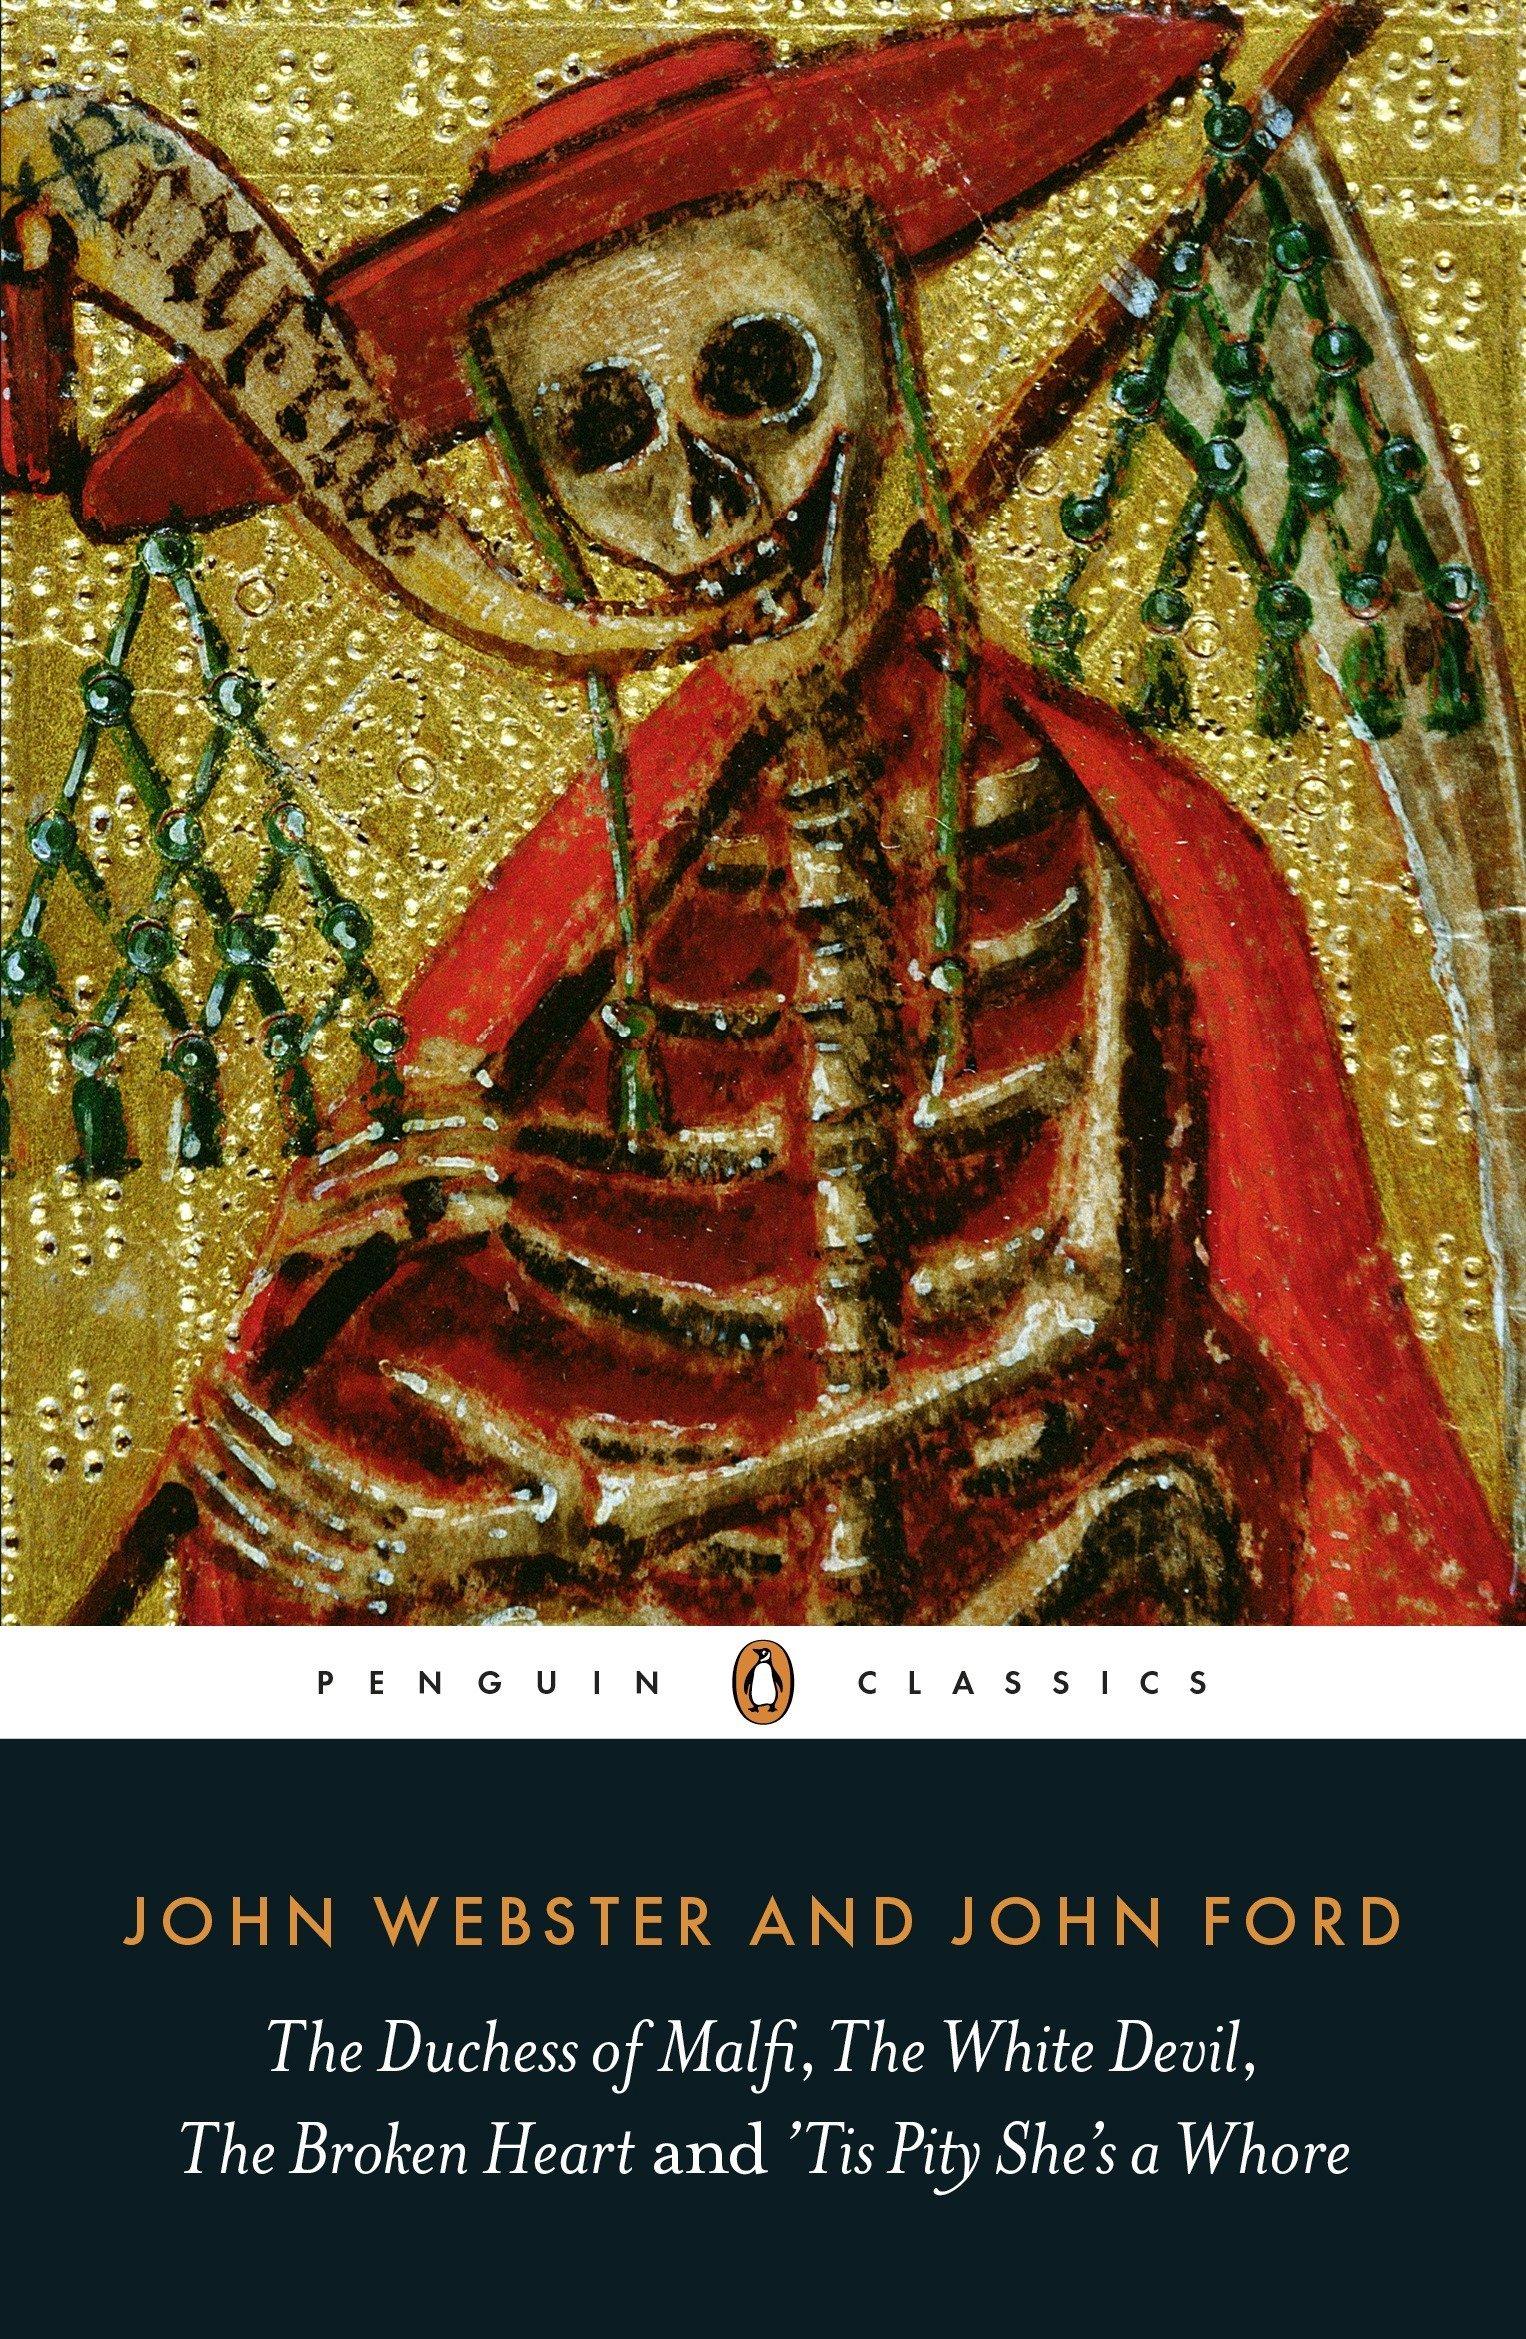 The Duchess of Malfi The White Devil The Broken Heart and 'Tis Pity She's a Whore (Penguin Classics)